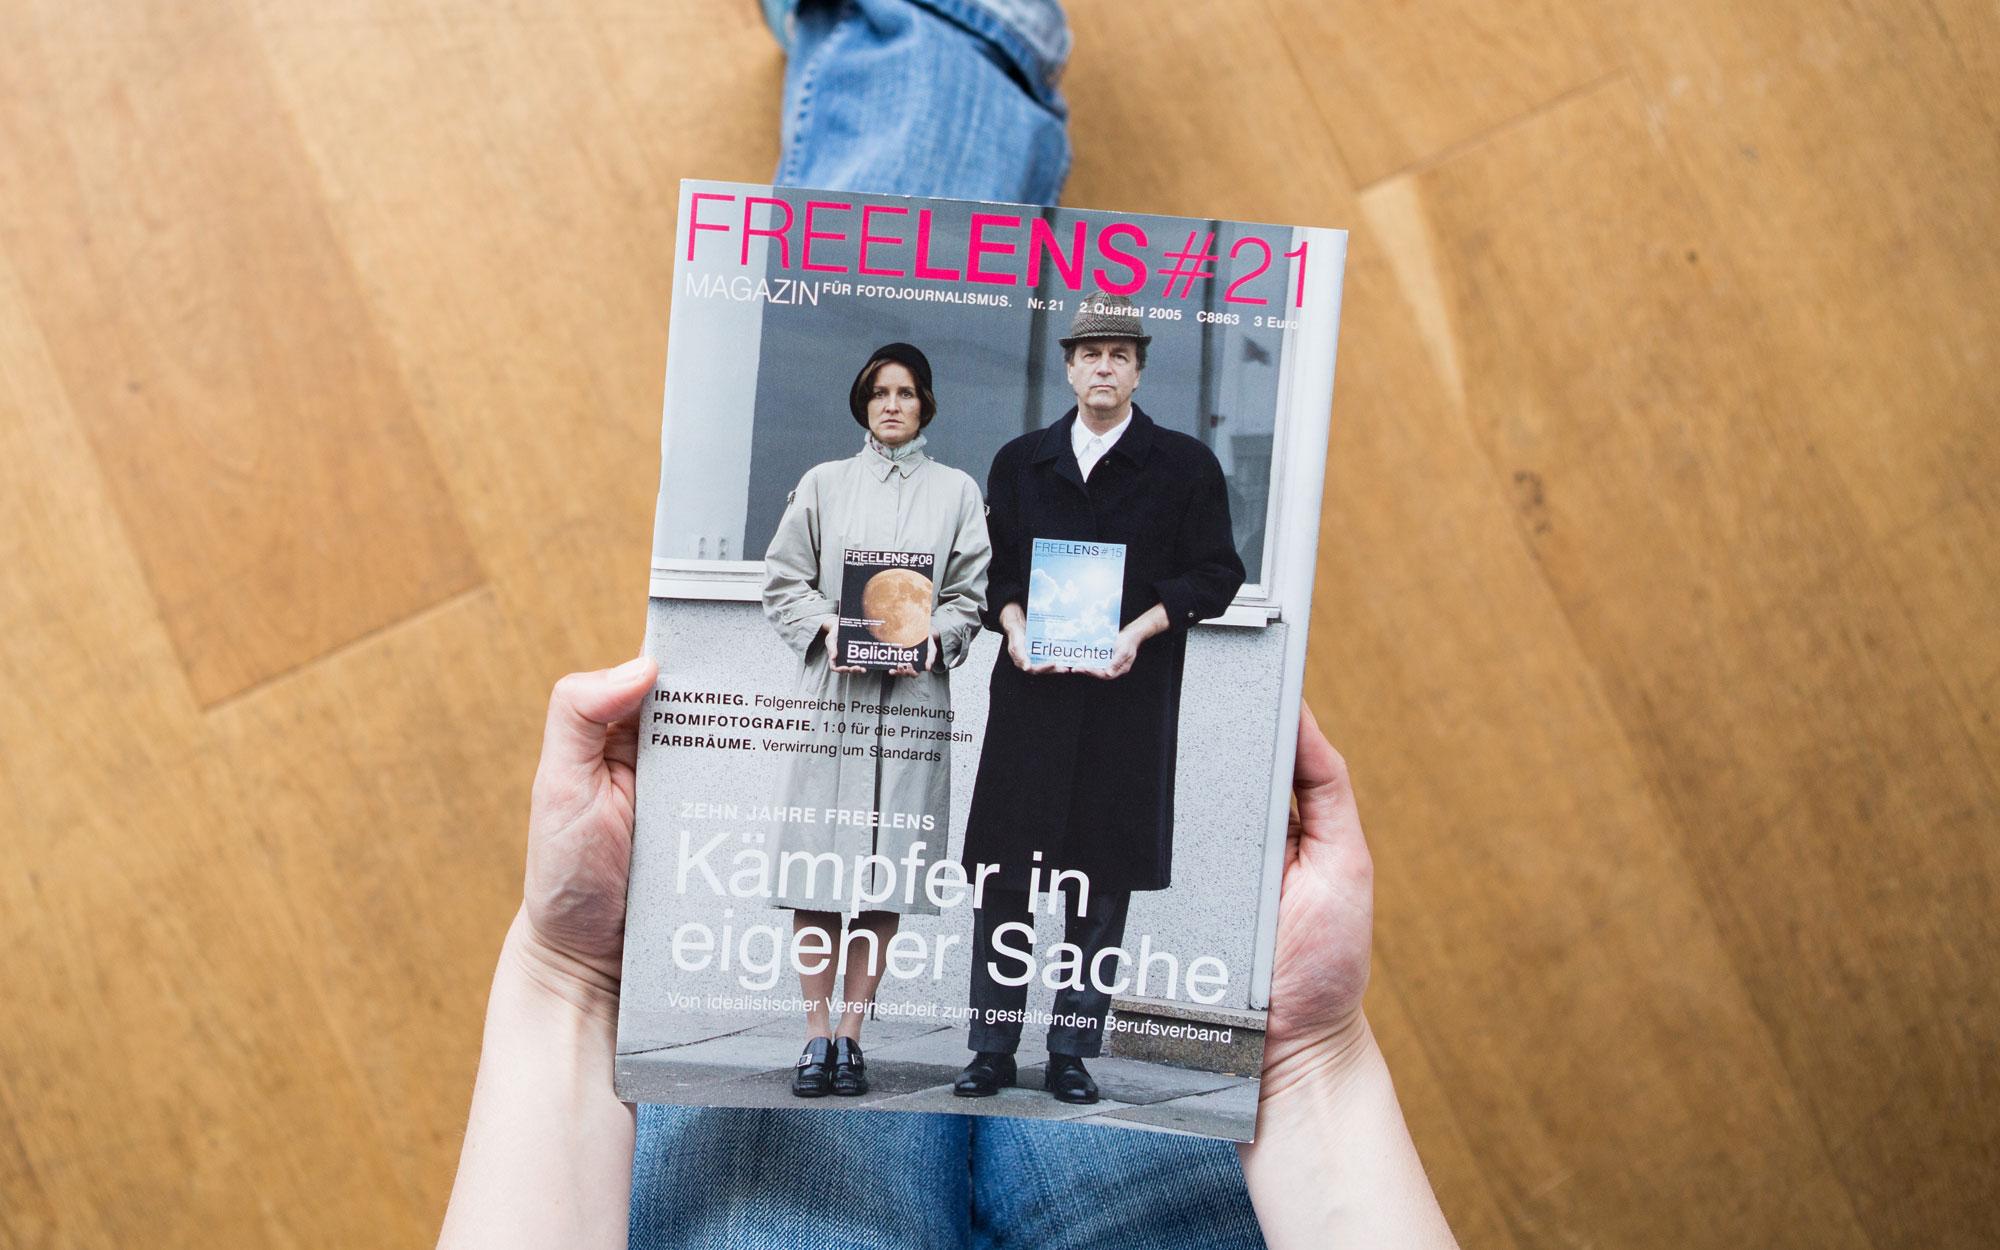 Zehn Jahre FREELENS – das Titelmotiv zum Jubiläum fotografierte Jörg Modrow. Foto: Lucas Wahl